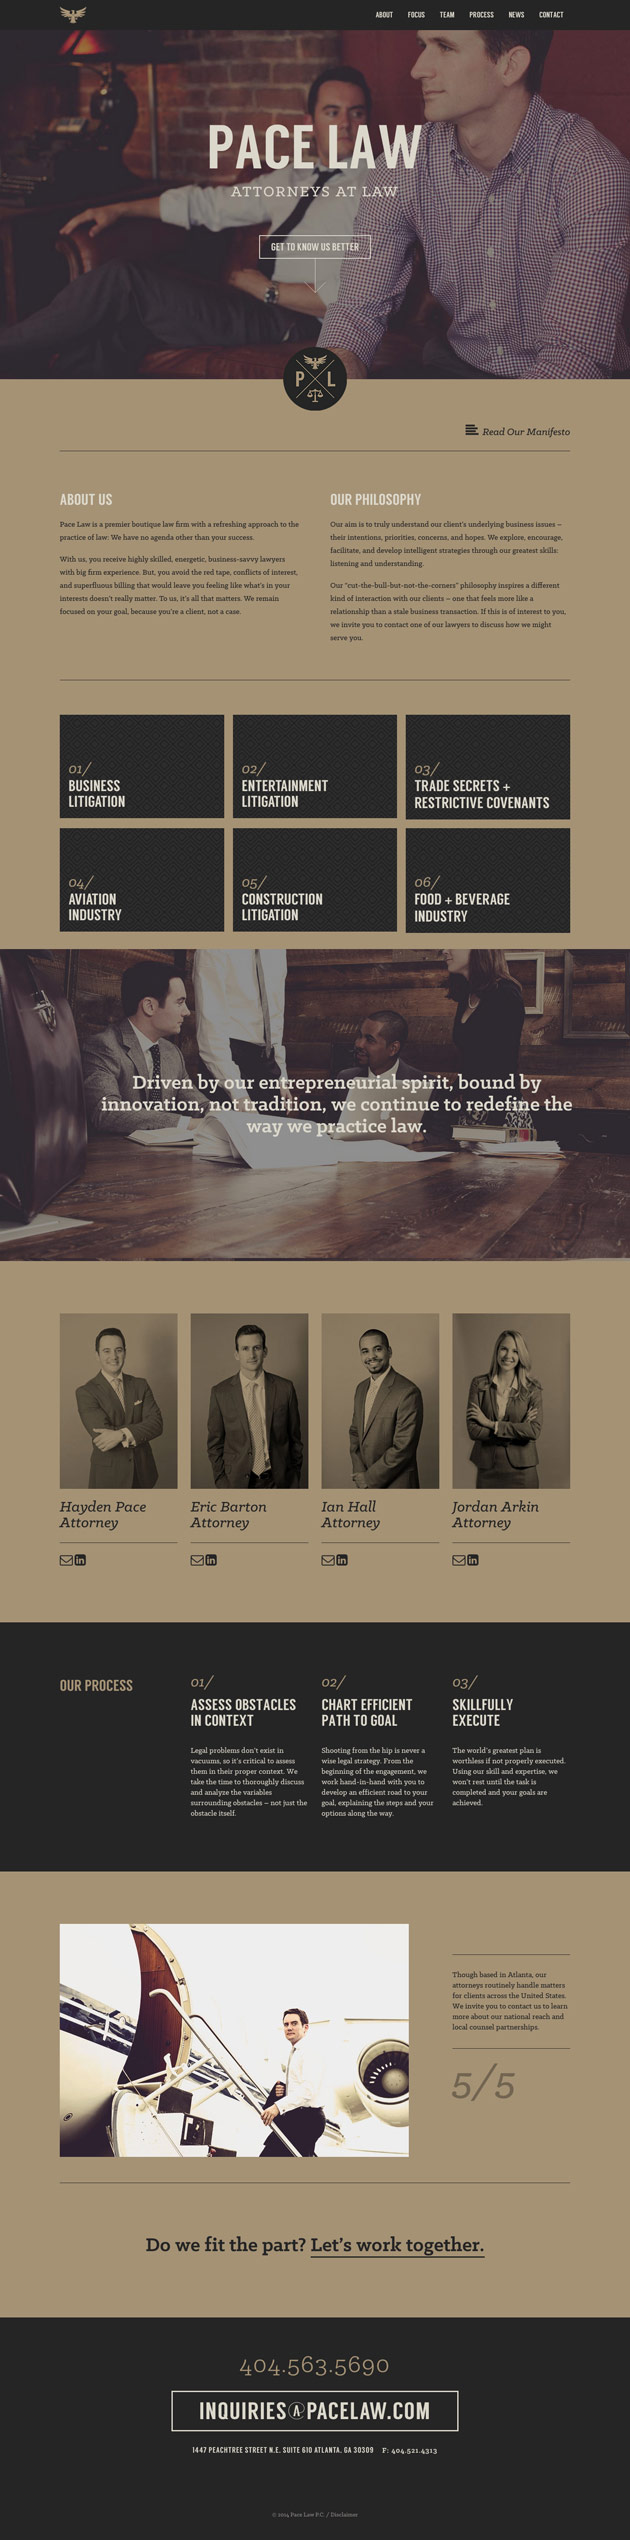 Pace Law - Inspiración web design